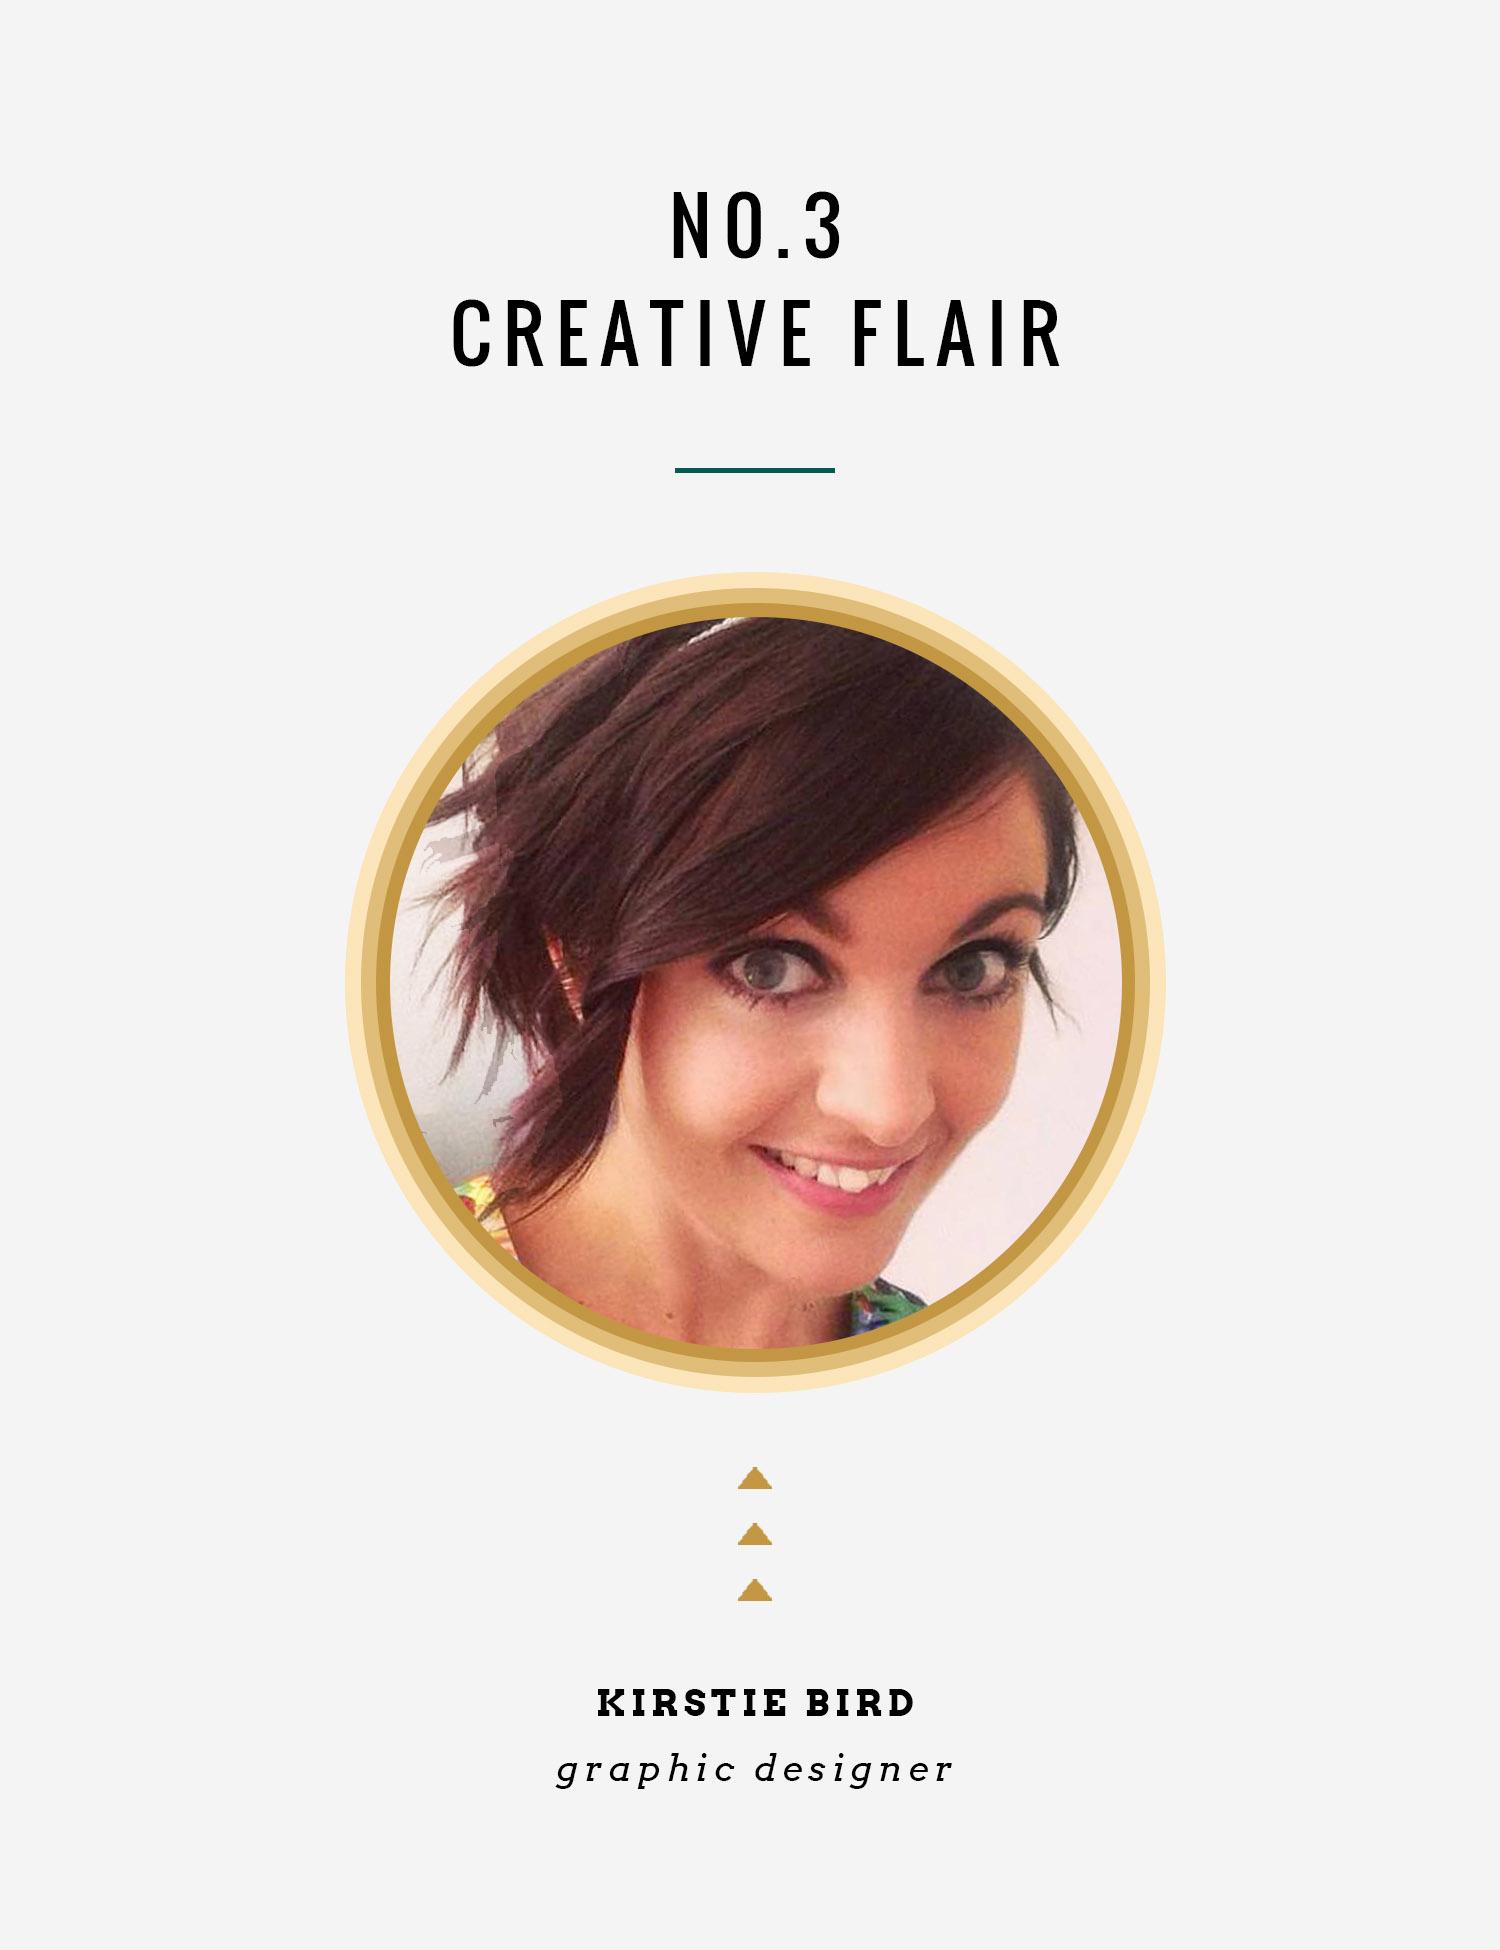 creativeflair_kirstiebird_designer